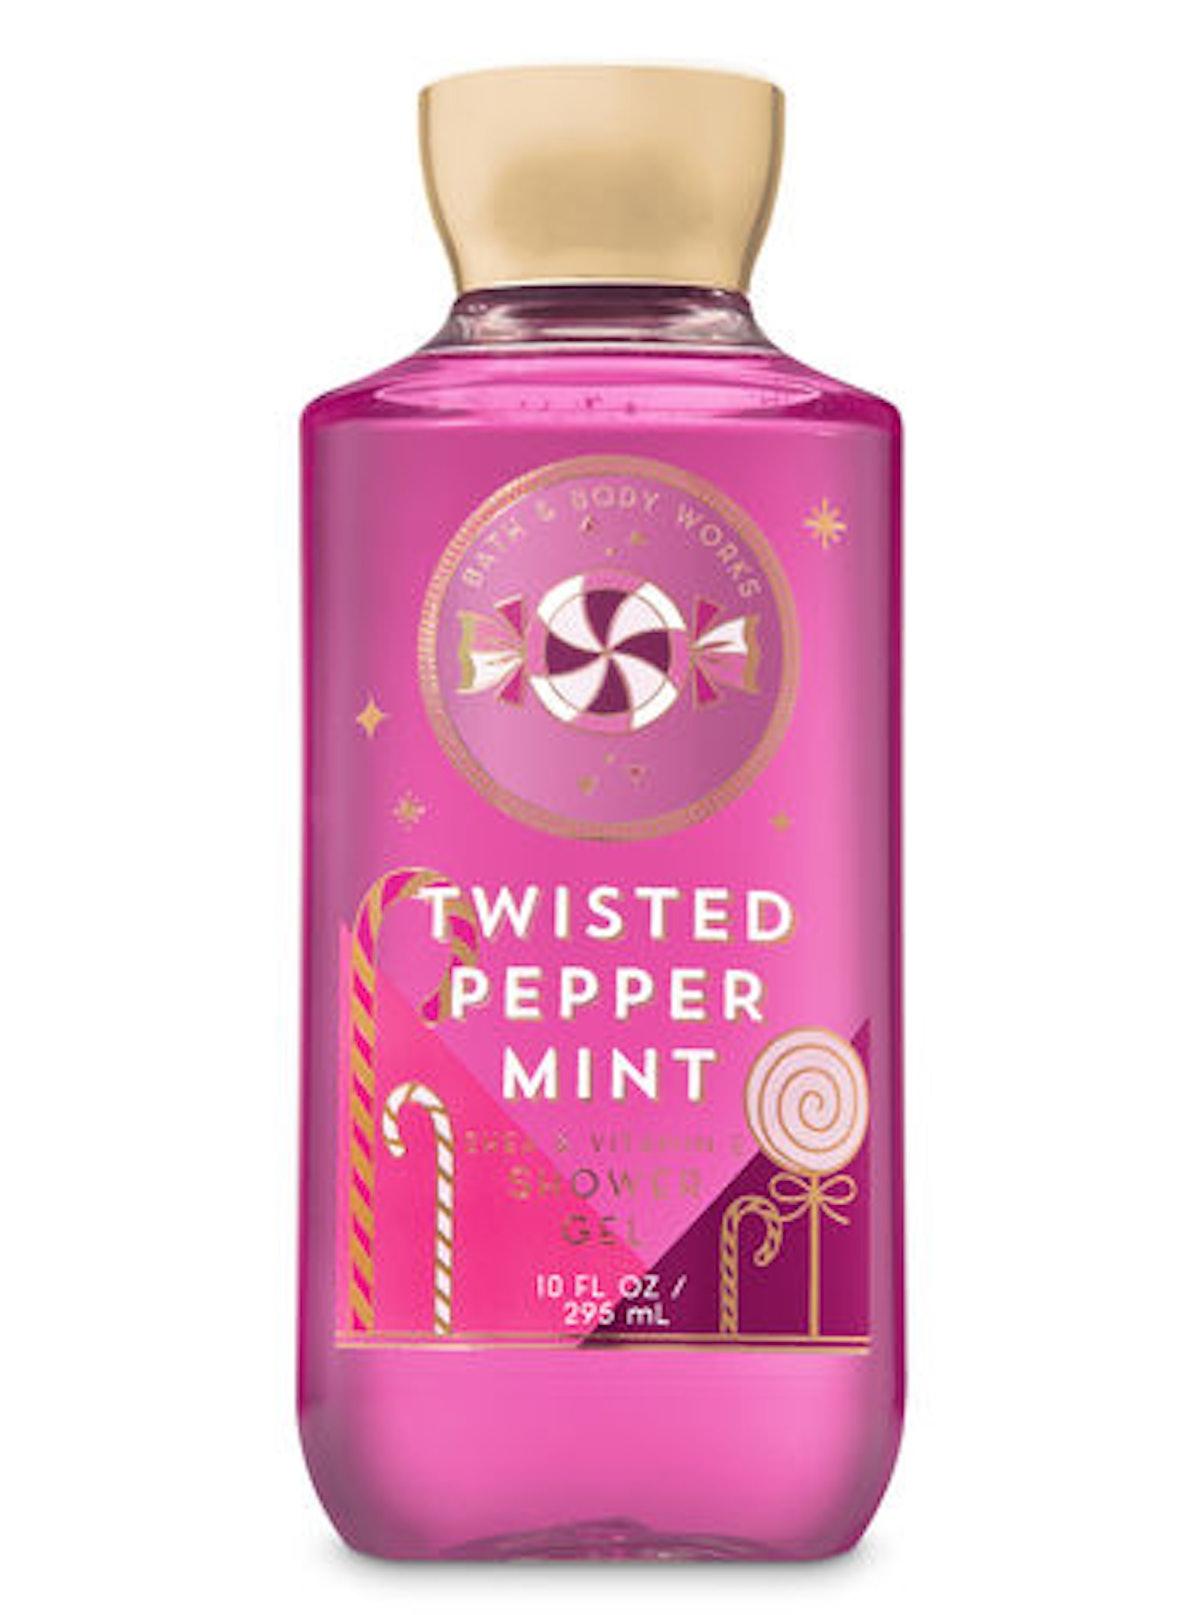 Twisted Peppermint Shower Gel